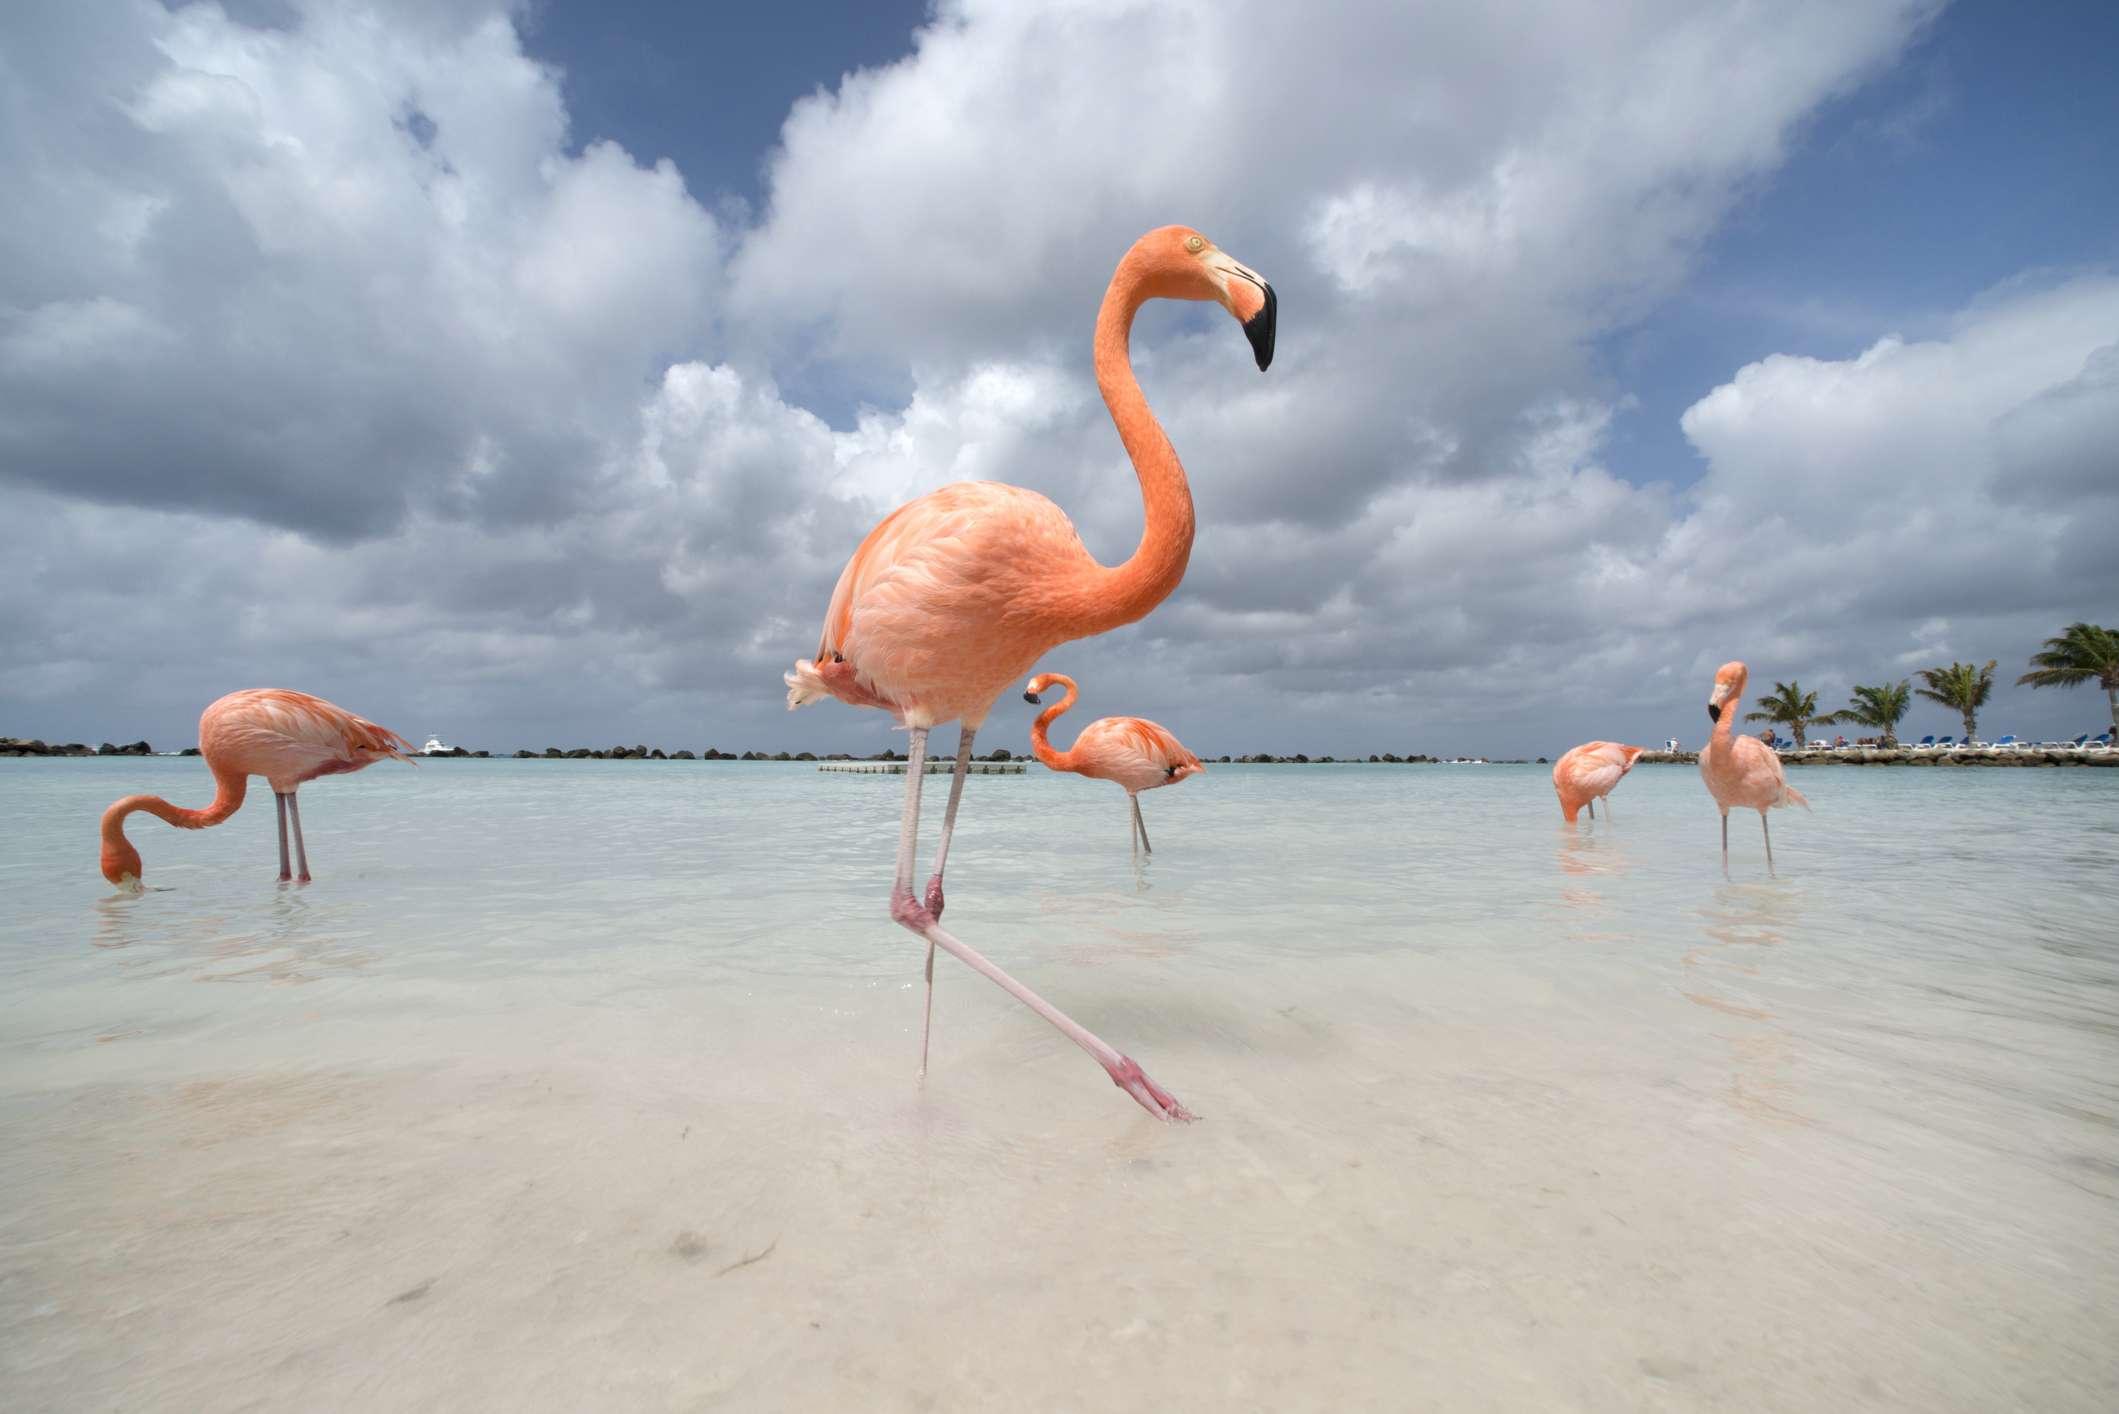 Flamingos at Flamingo Beach, Aruba